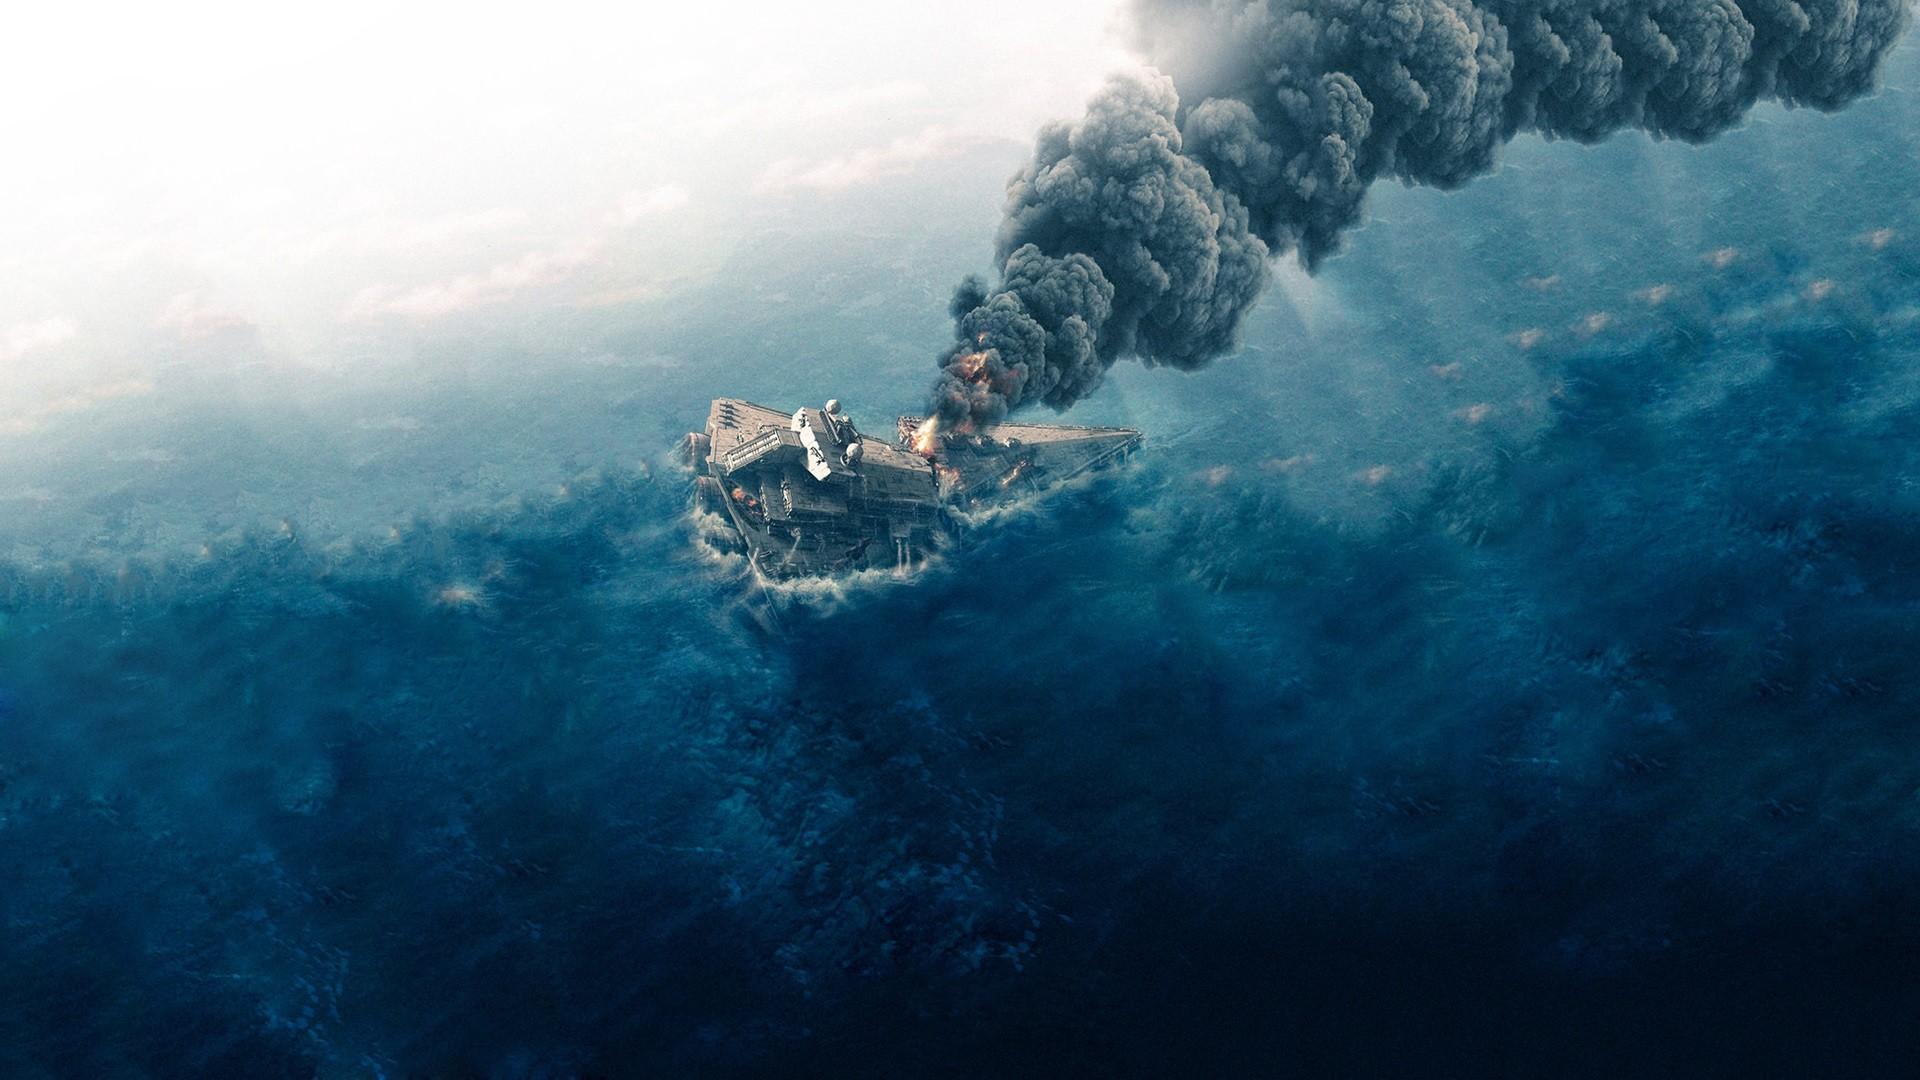 Star Wars, Star Destroyer 4k Hd Wallpaper - Star Wars Aftermath Poster , HD Wallpaper & Backgrounds